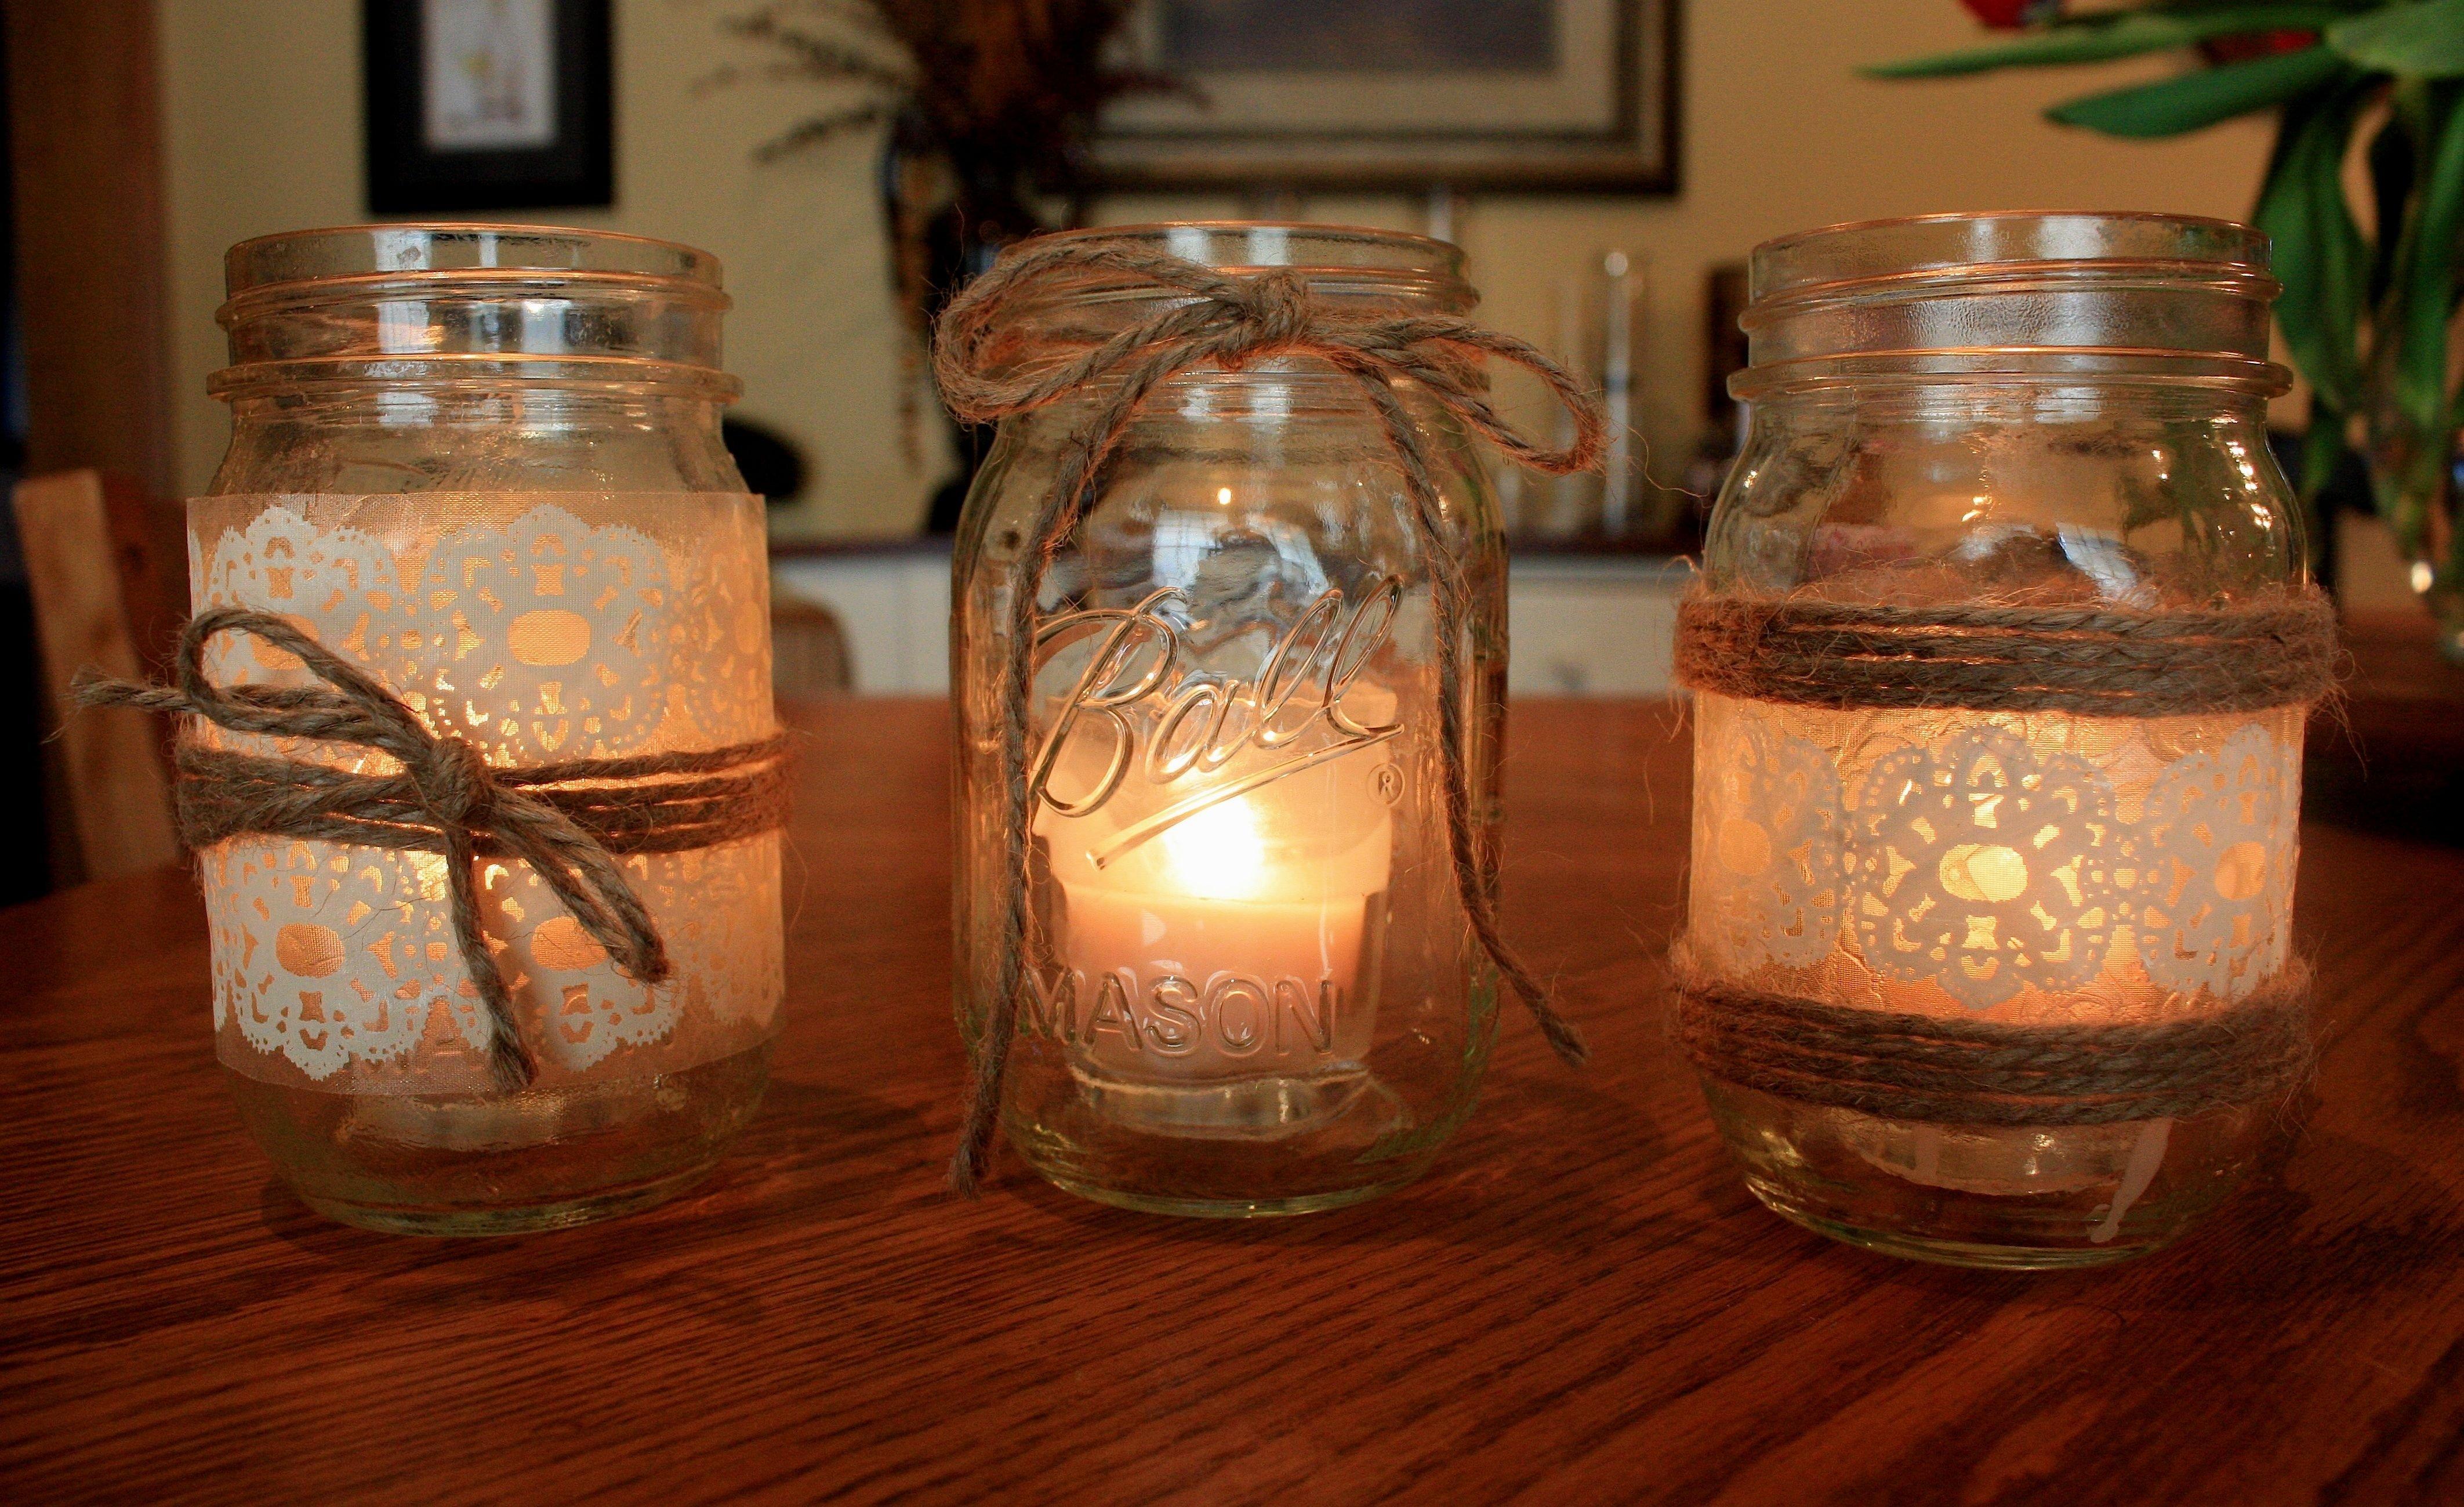 10 Fantastic Country Wedding Ideas Mason Jars wedding ideas mason jars country decorations jar dma homes 79589 2020